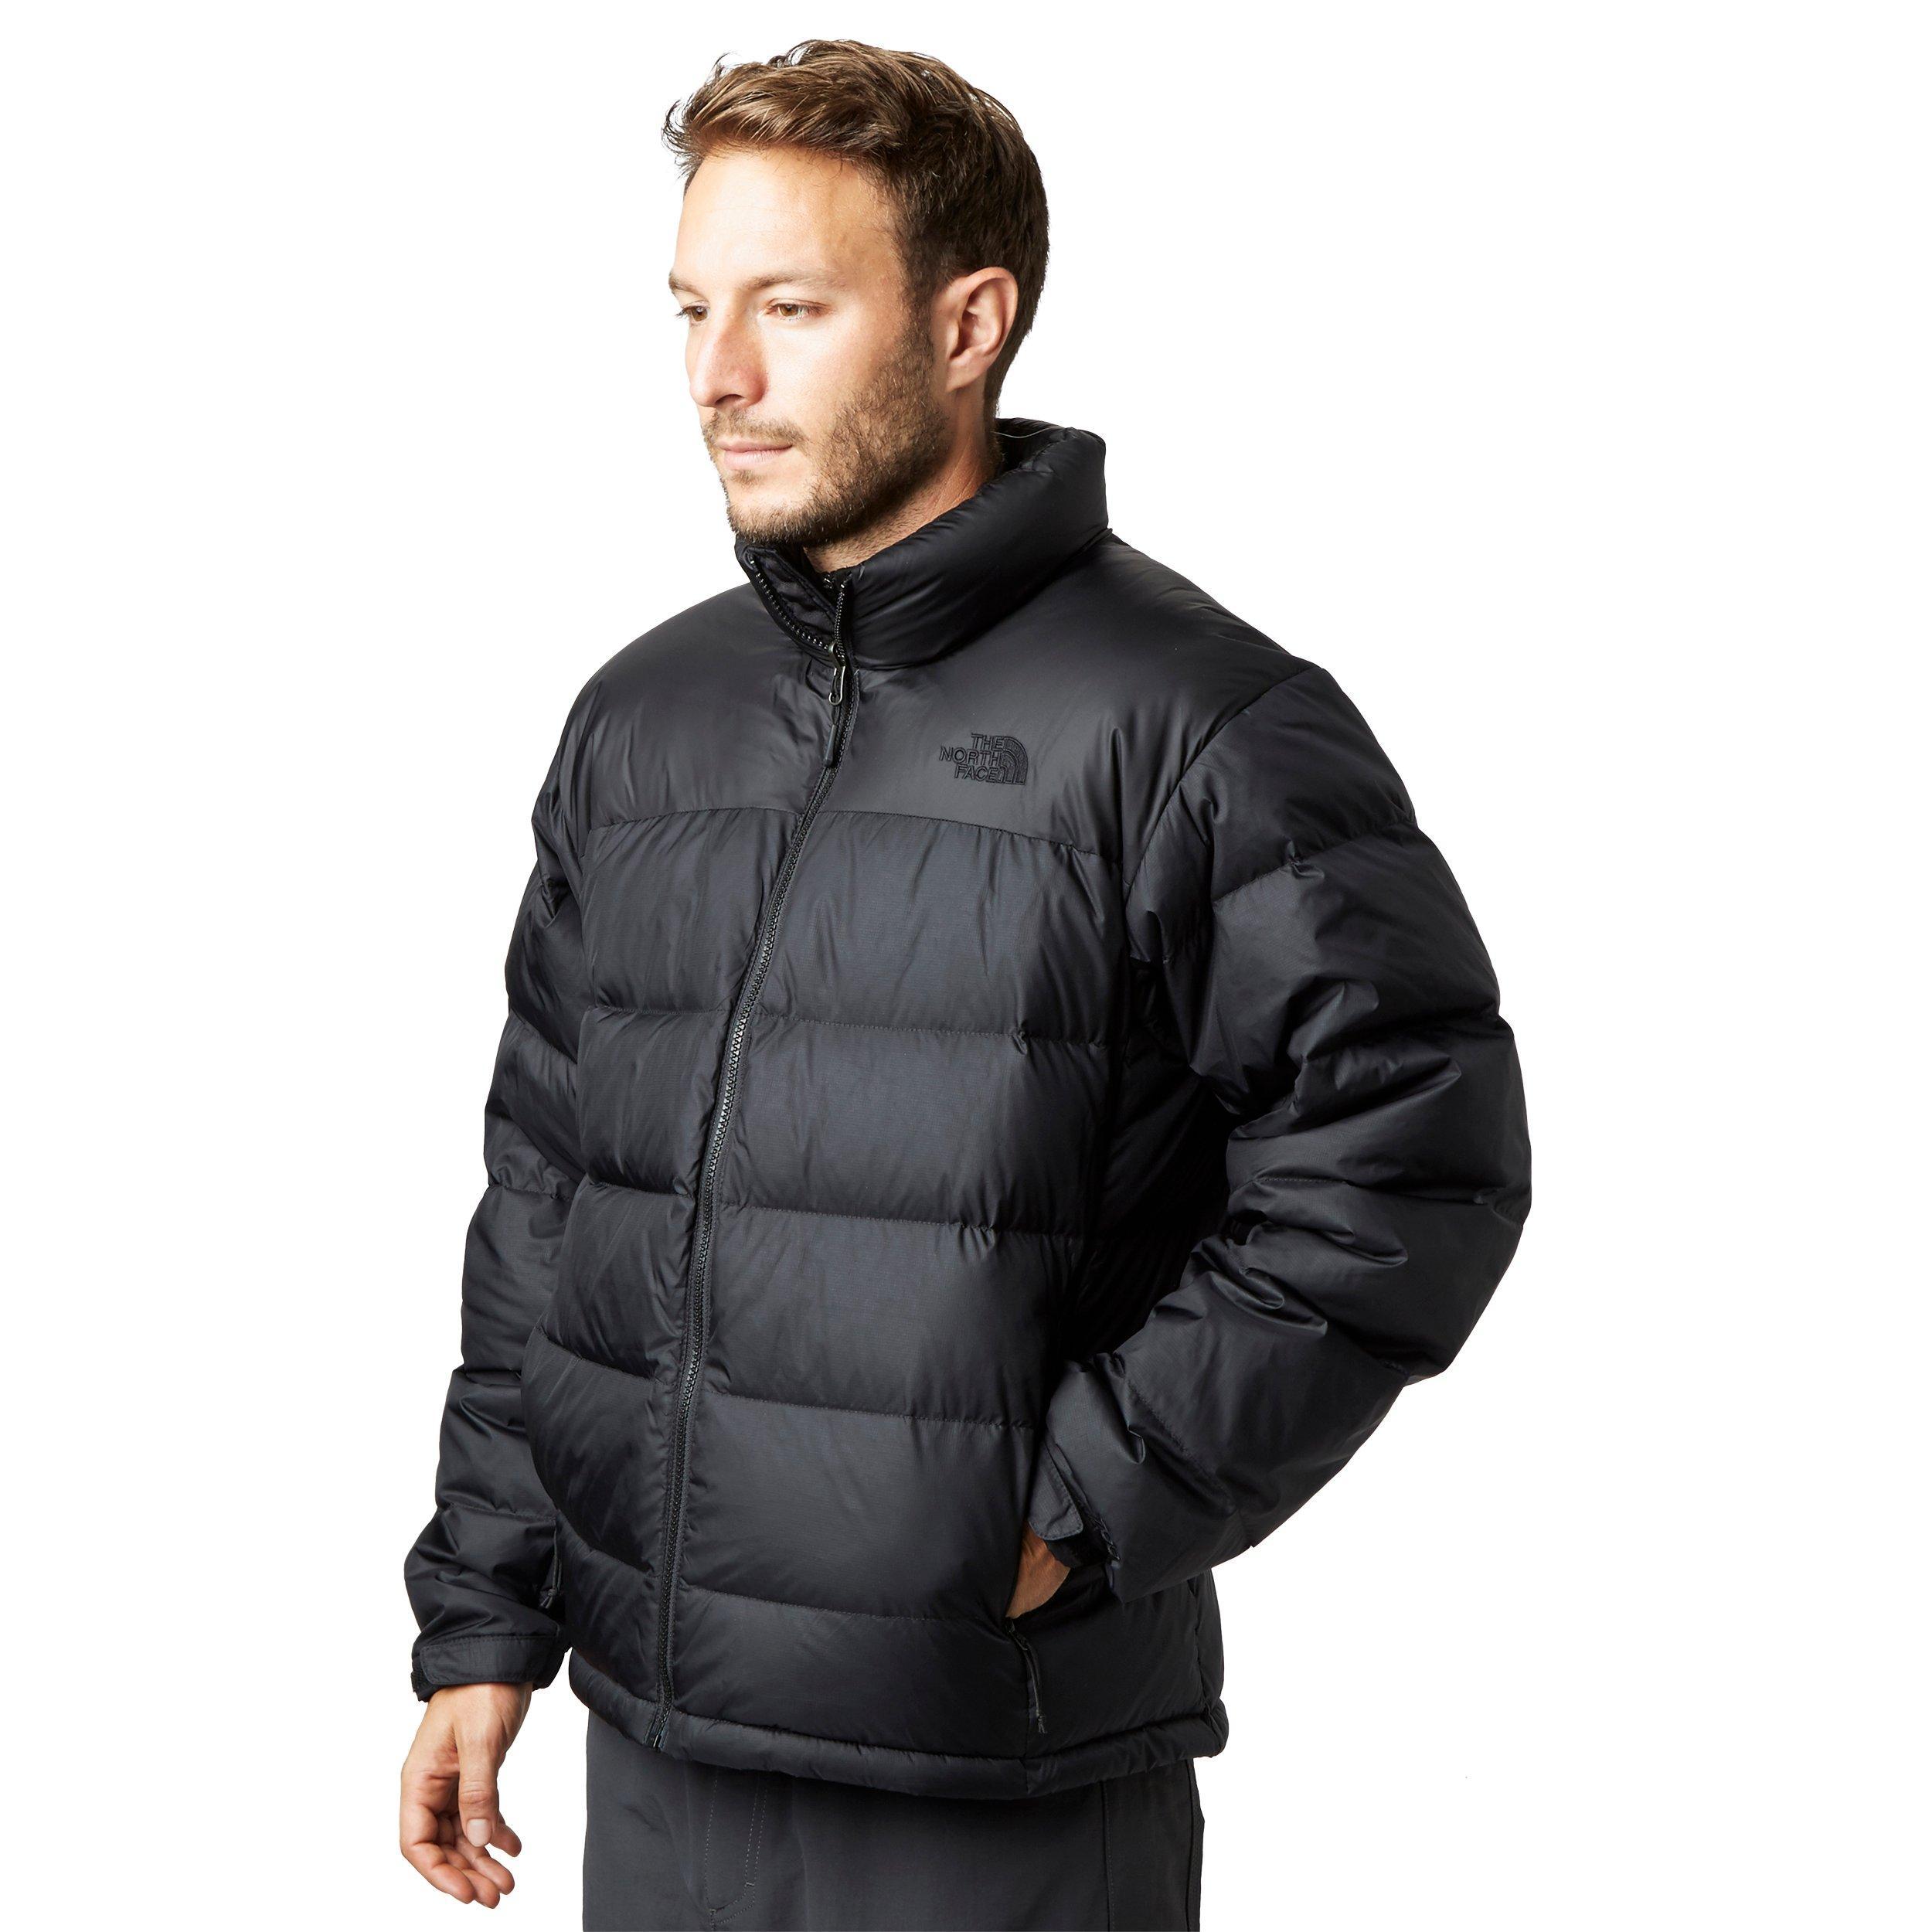 Men's nuptse 2 jacket black